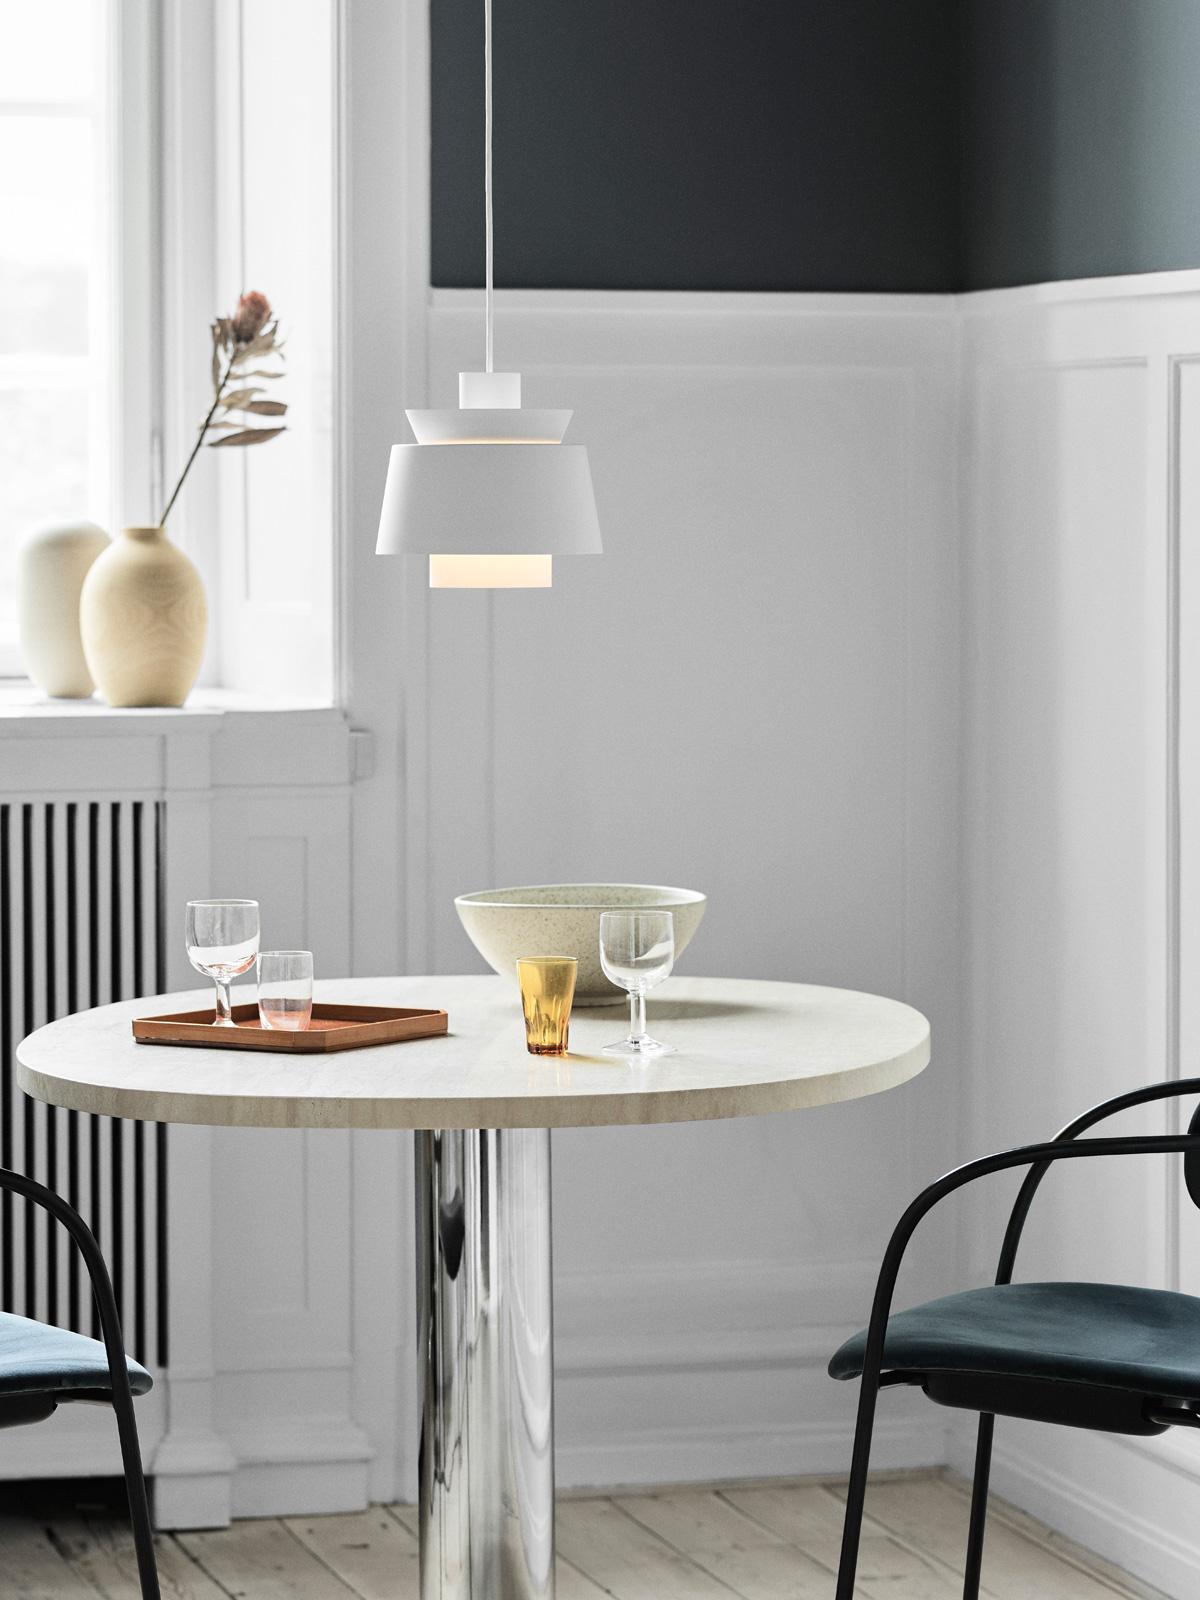 DesignOrt Blog: &tradition Utzon Pendelleuchte Hängelampe skandinavisch Design Klassiker Lampe skandinavisch